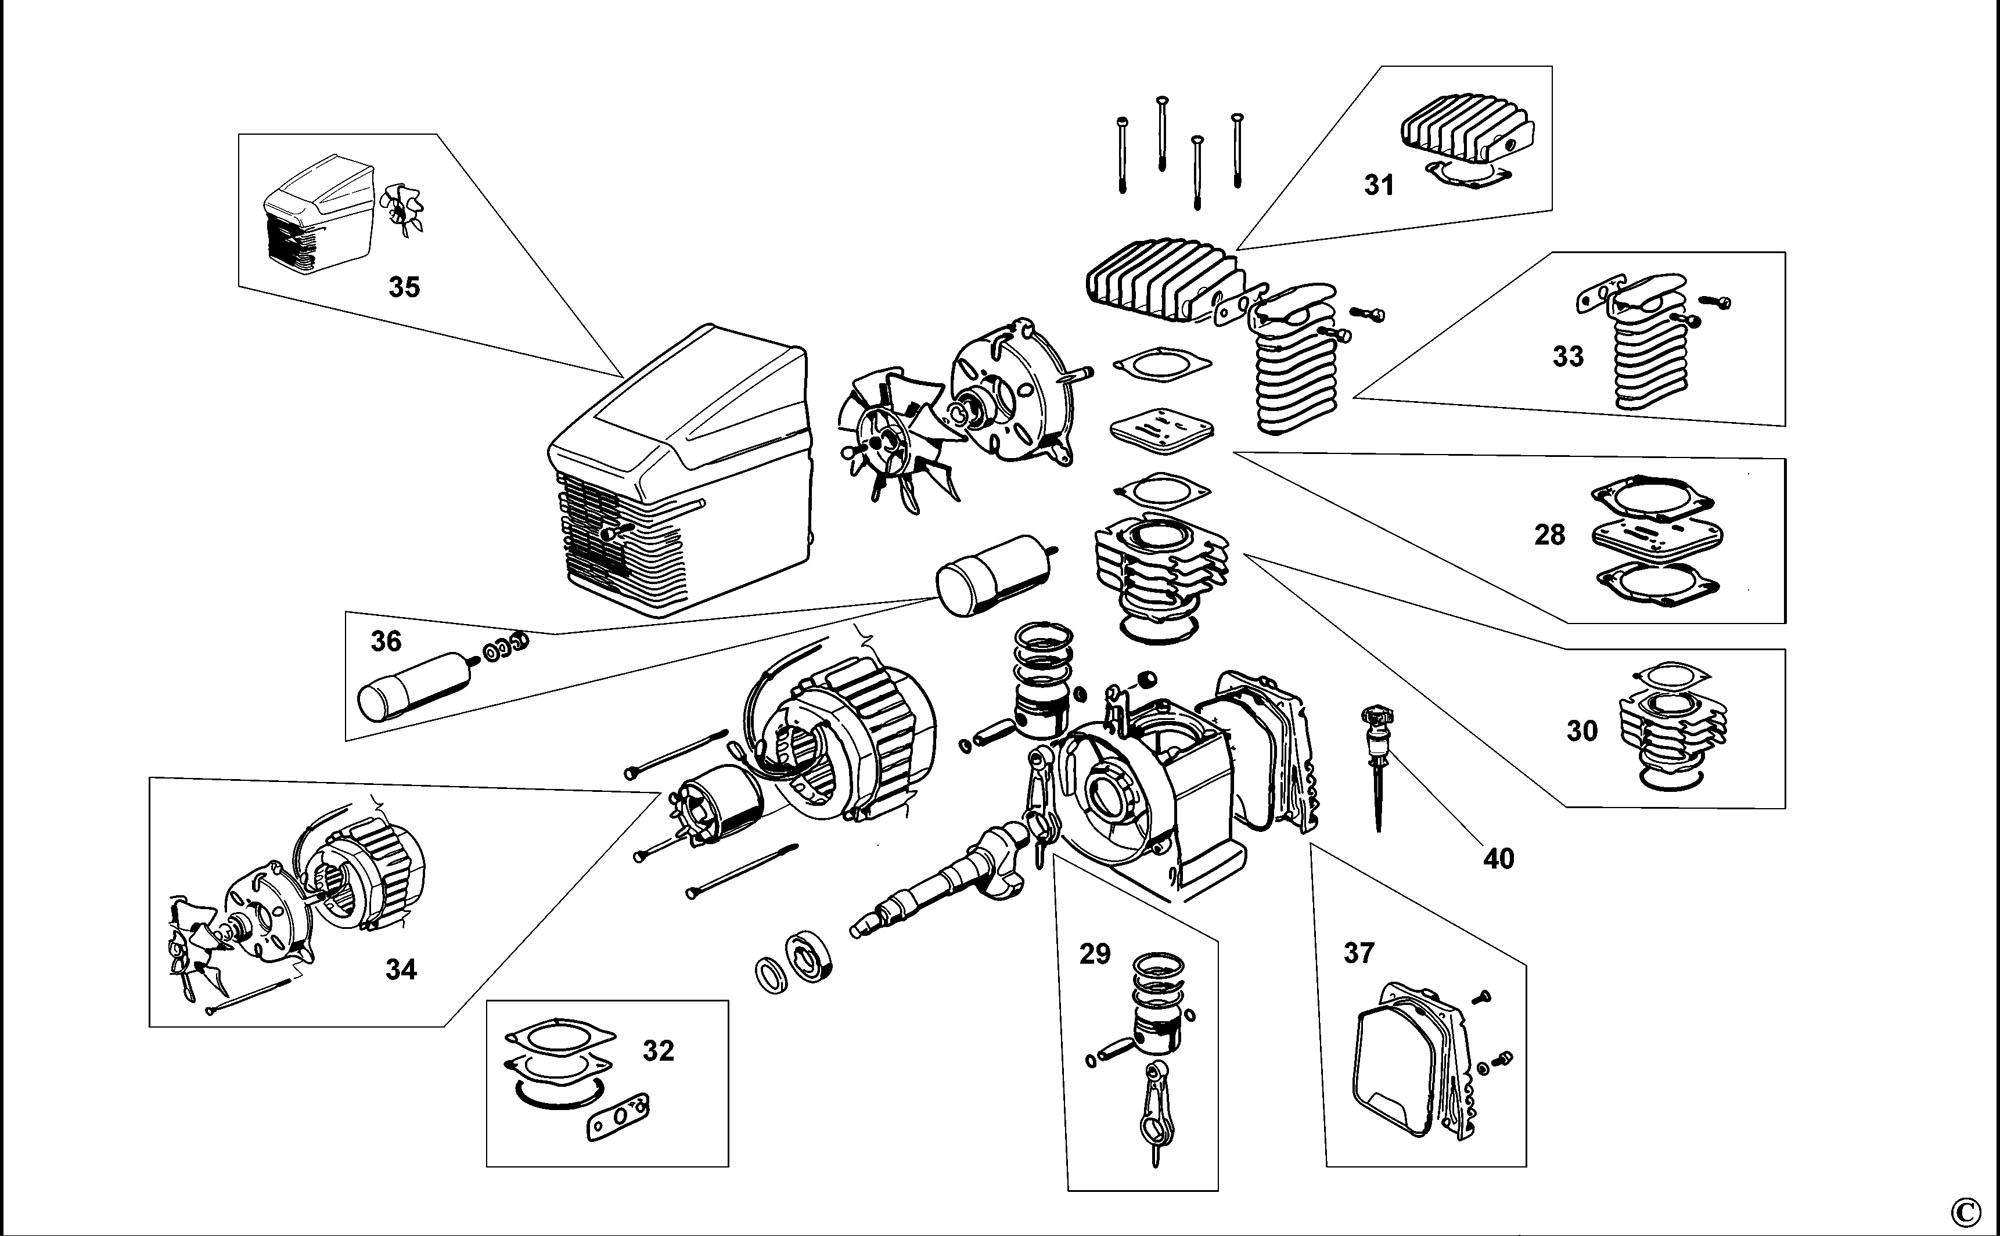 Spares for Bostitch Ps20 Compressor (type Reva) SPARE_PS20